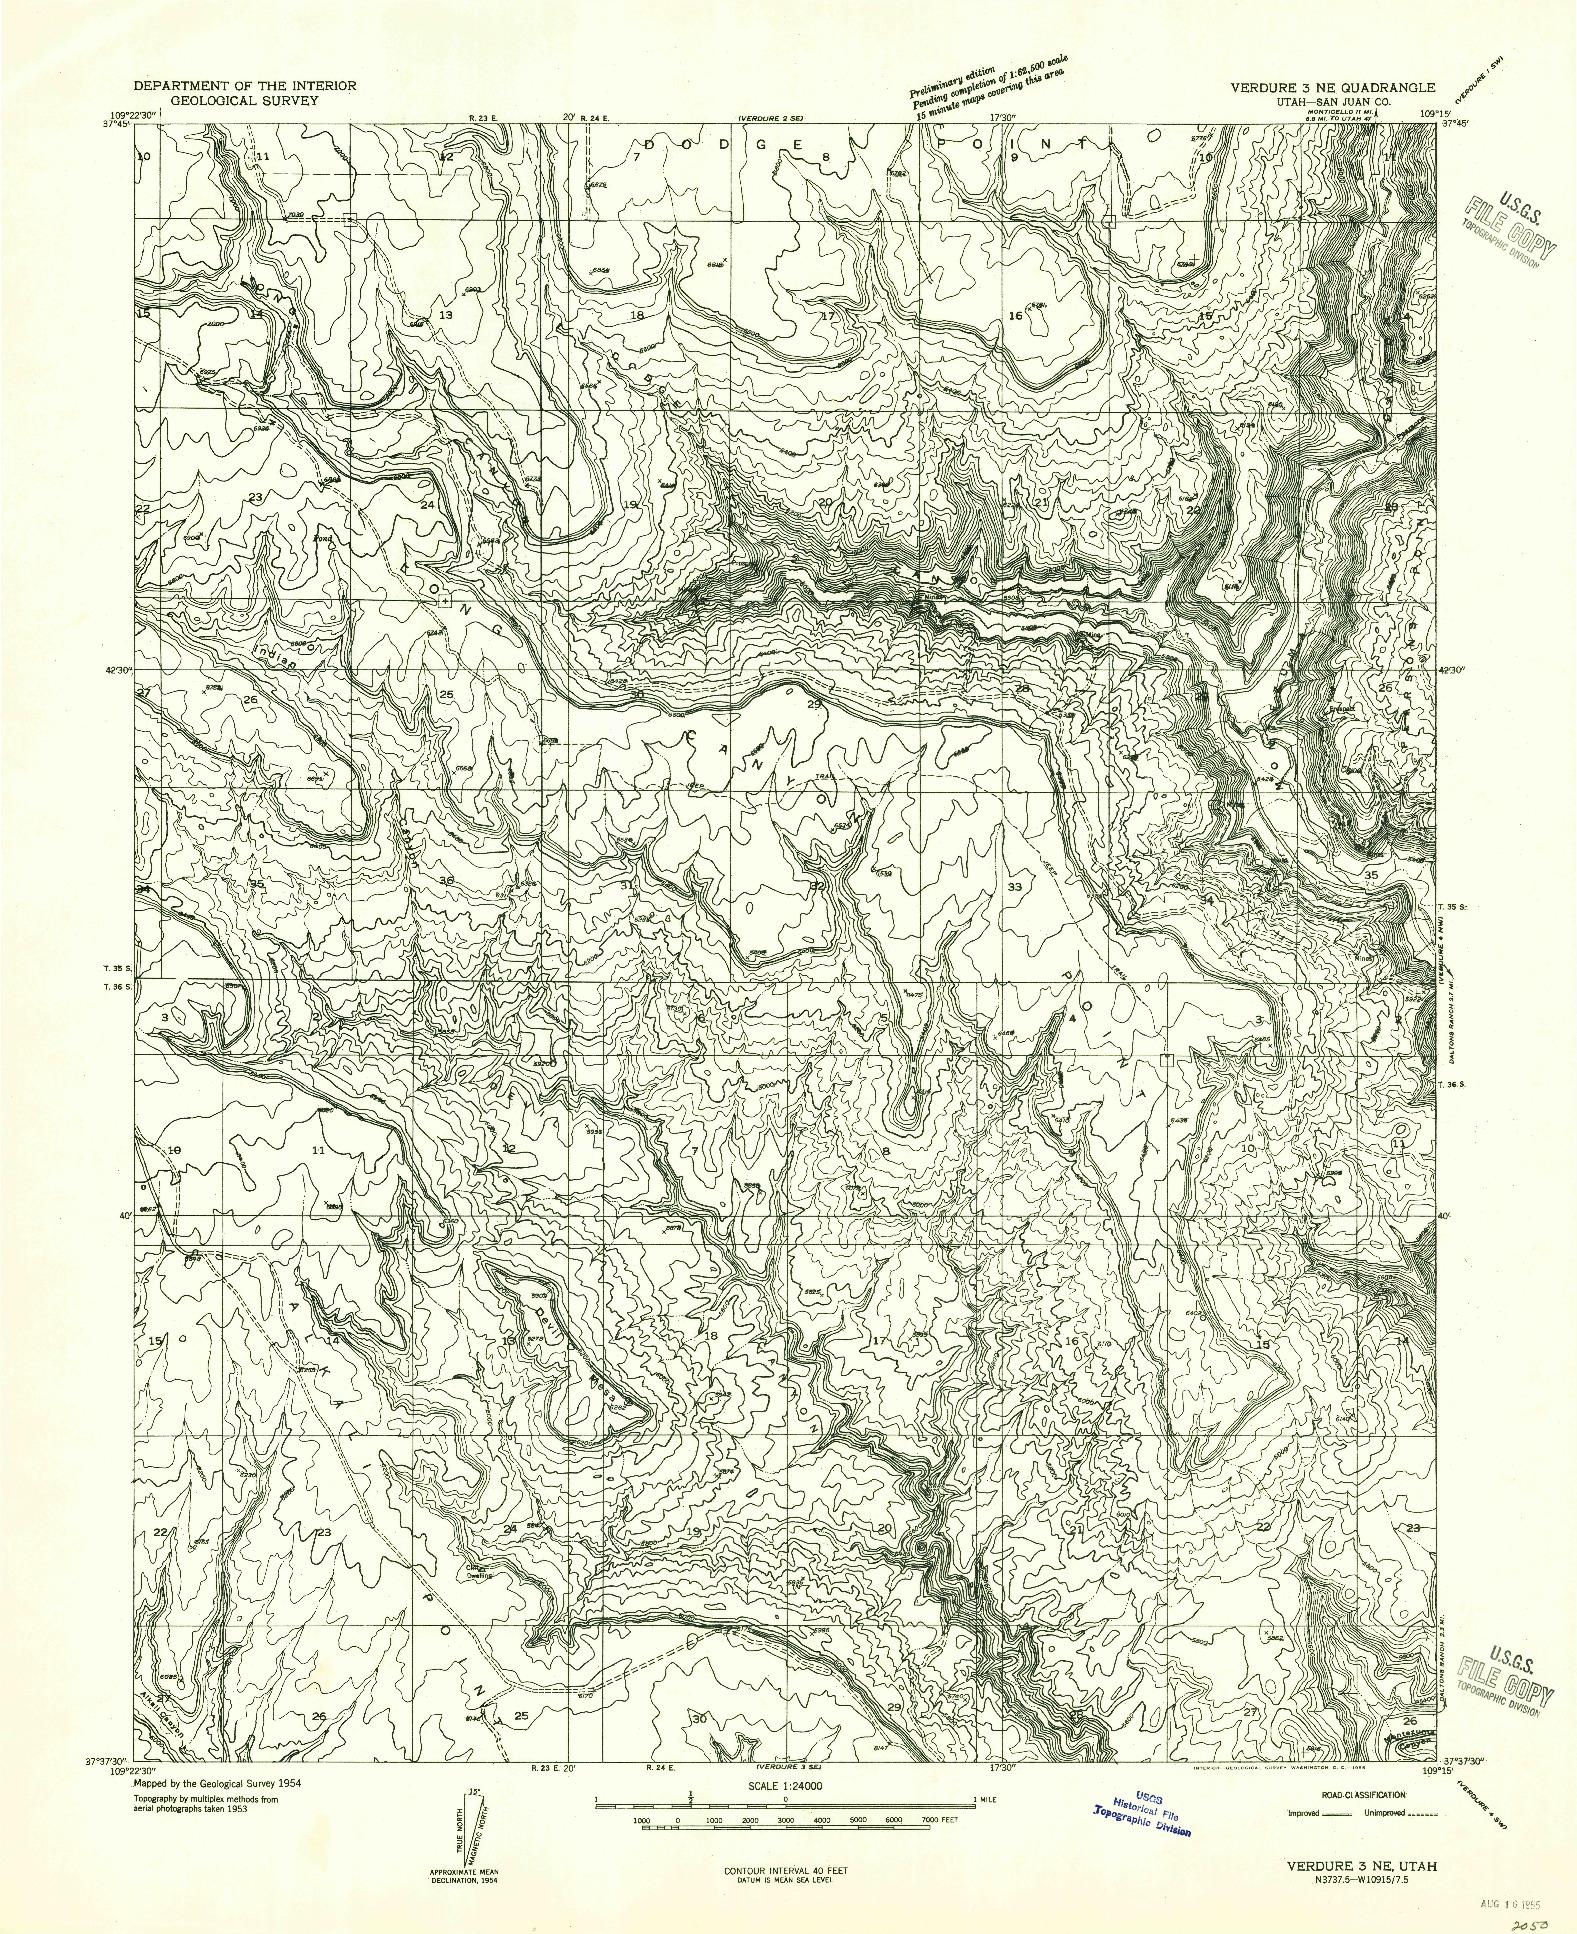 USGS 1:24000-SCALE QUADRANGLE FOR VERDURE 3 NE, UT 1955